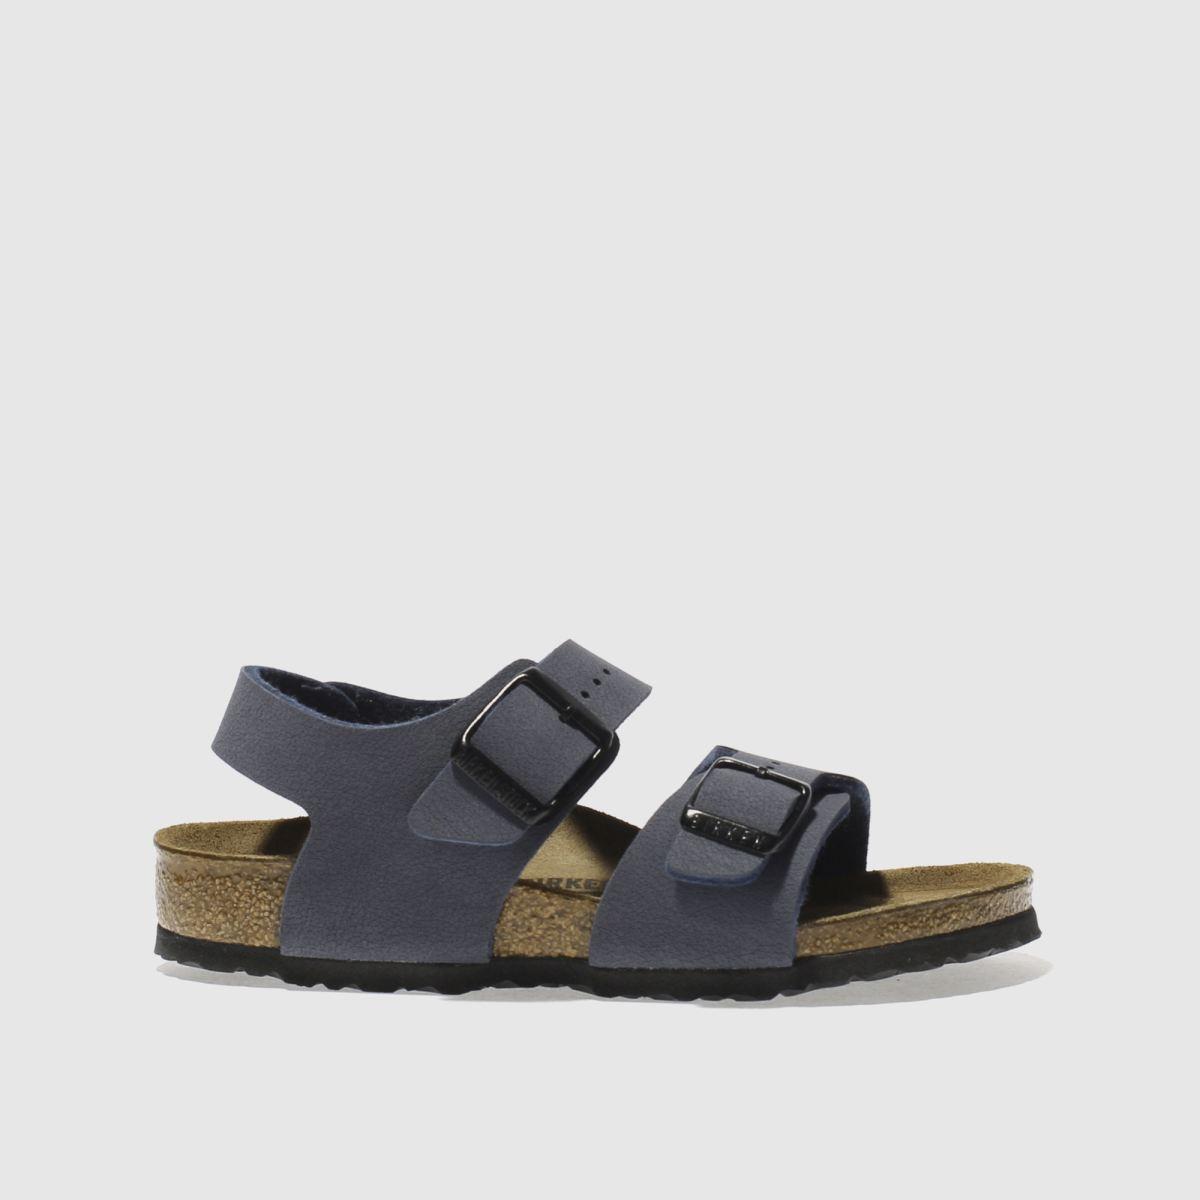 Birkenstock Navy New York Boys Toddler Sandals